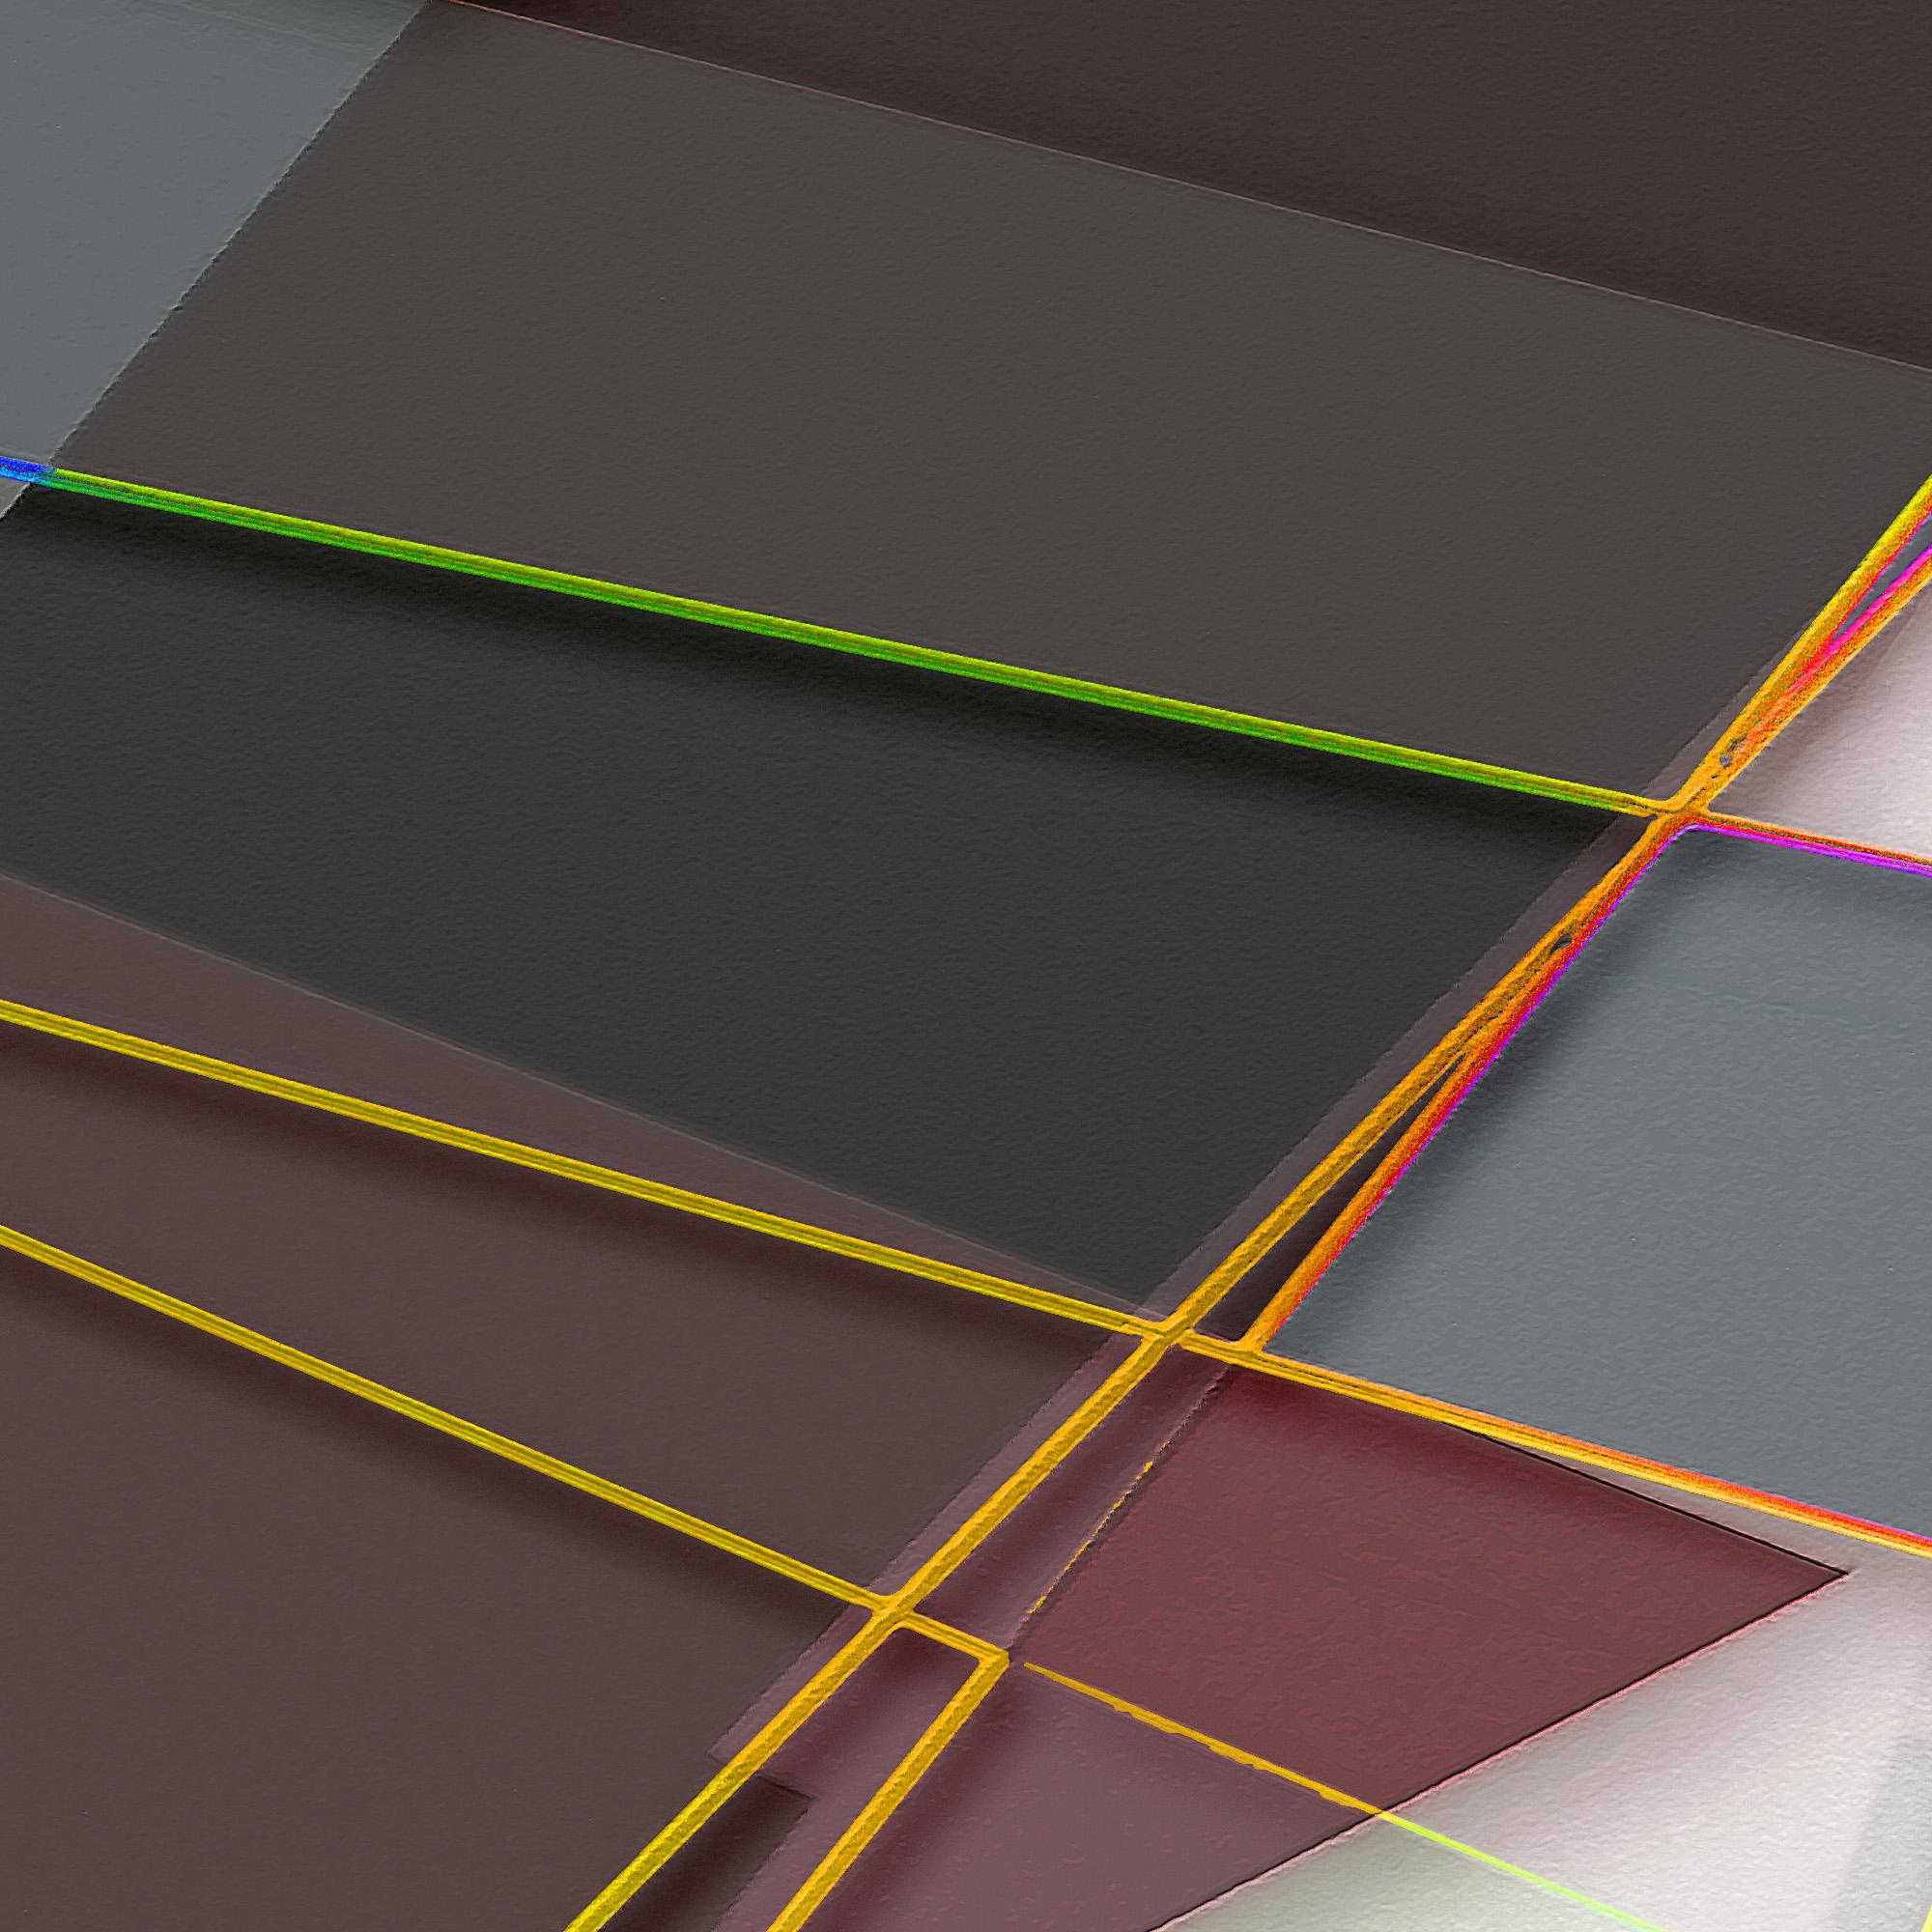 190209_Improbable_Streetlight_detail1.jpg